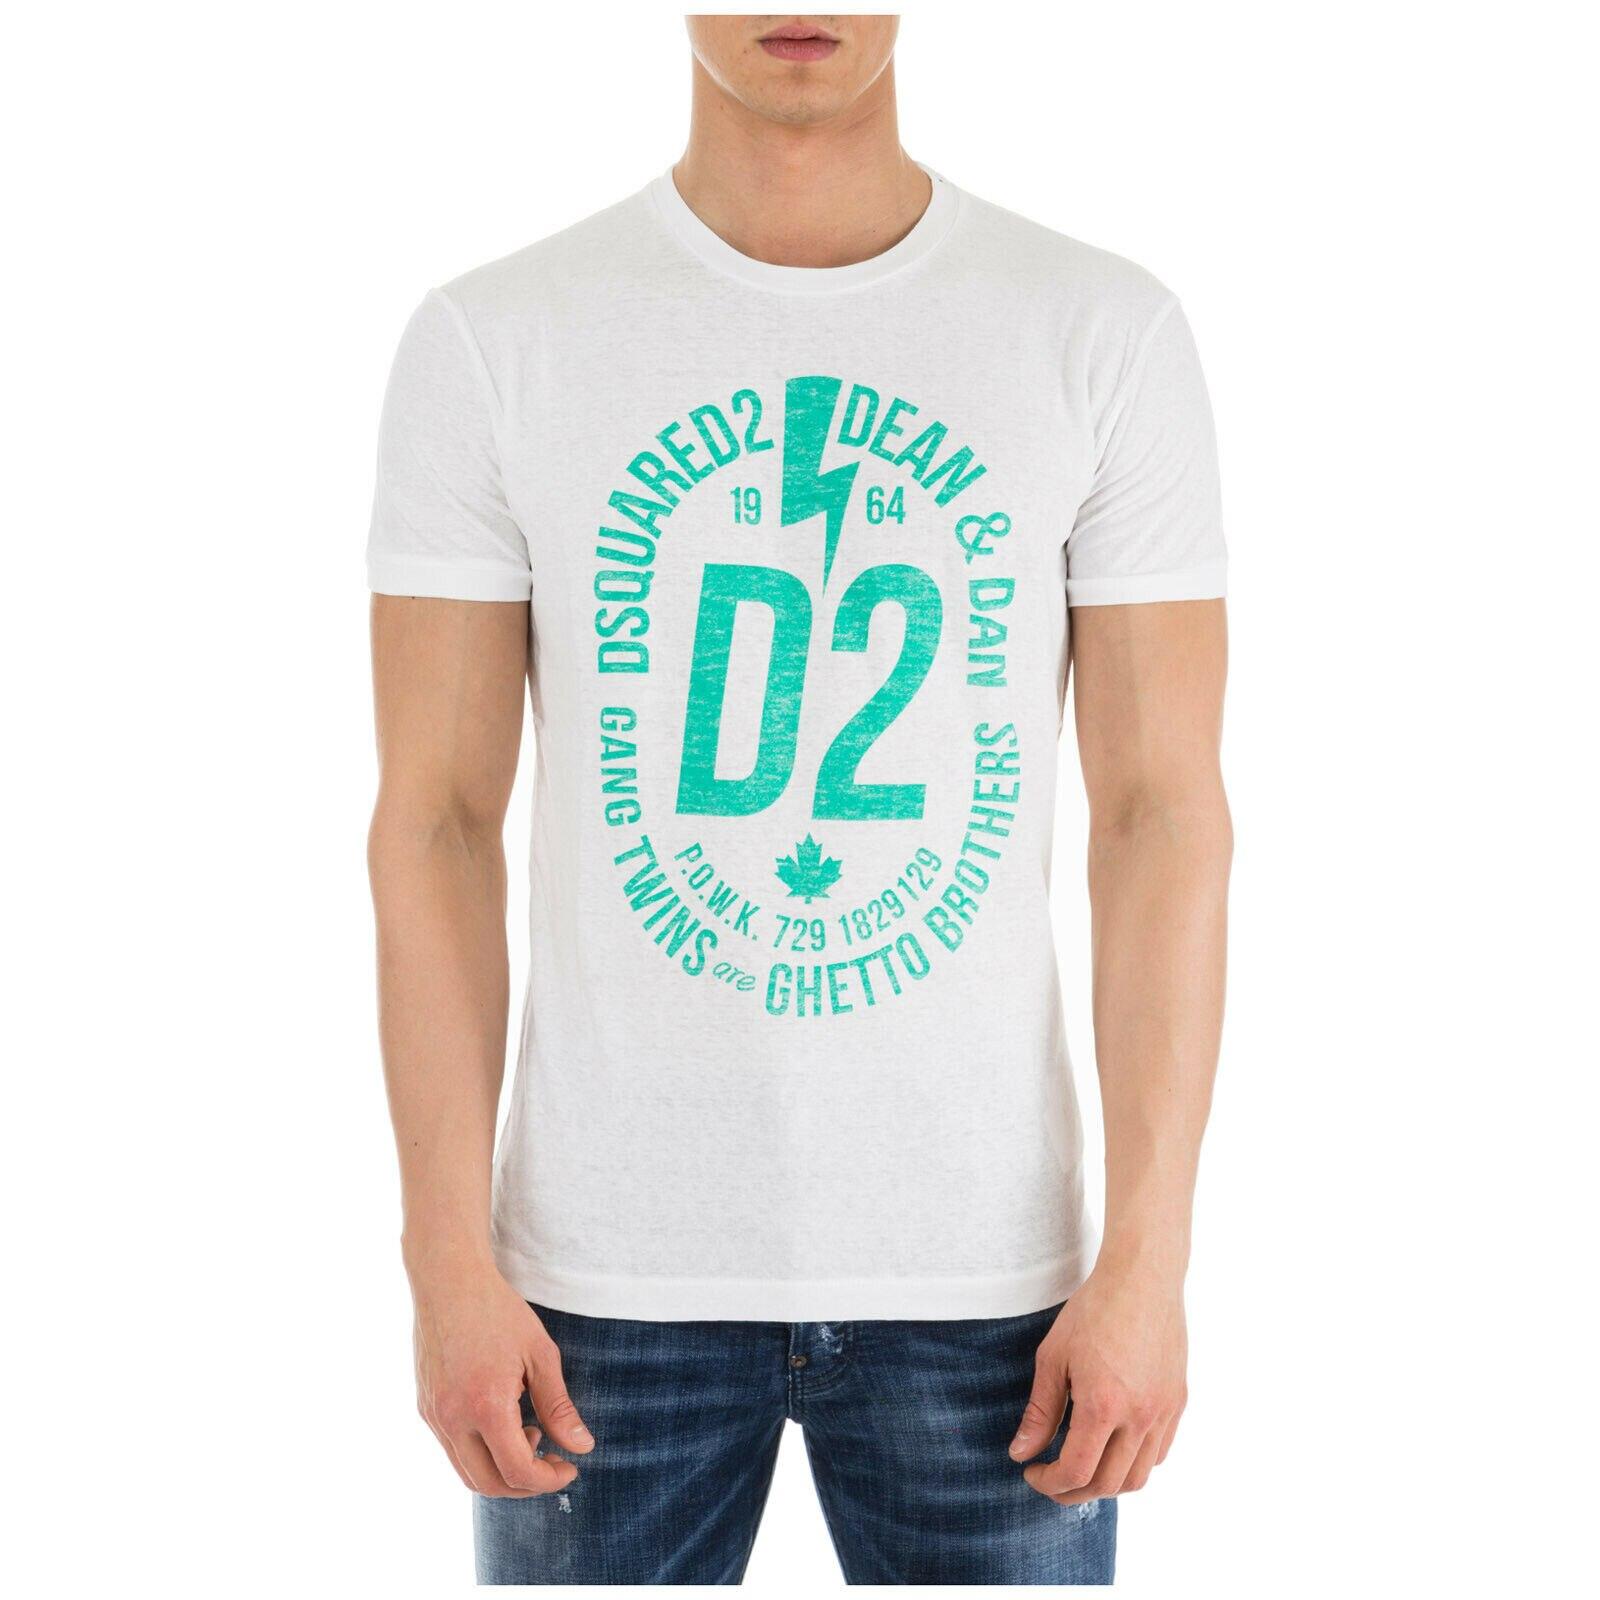 New Dsq2 MenS Short Sleeve T-Shirt Crew Neckline Jumper New White Printed Tee Unisex Size S-3Xl